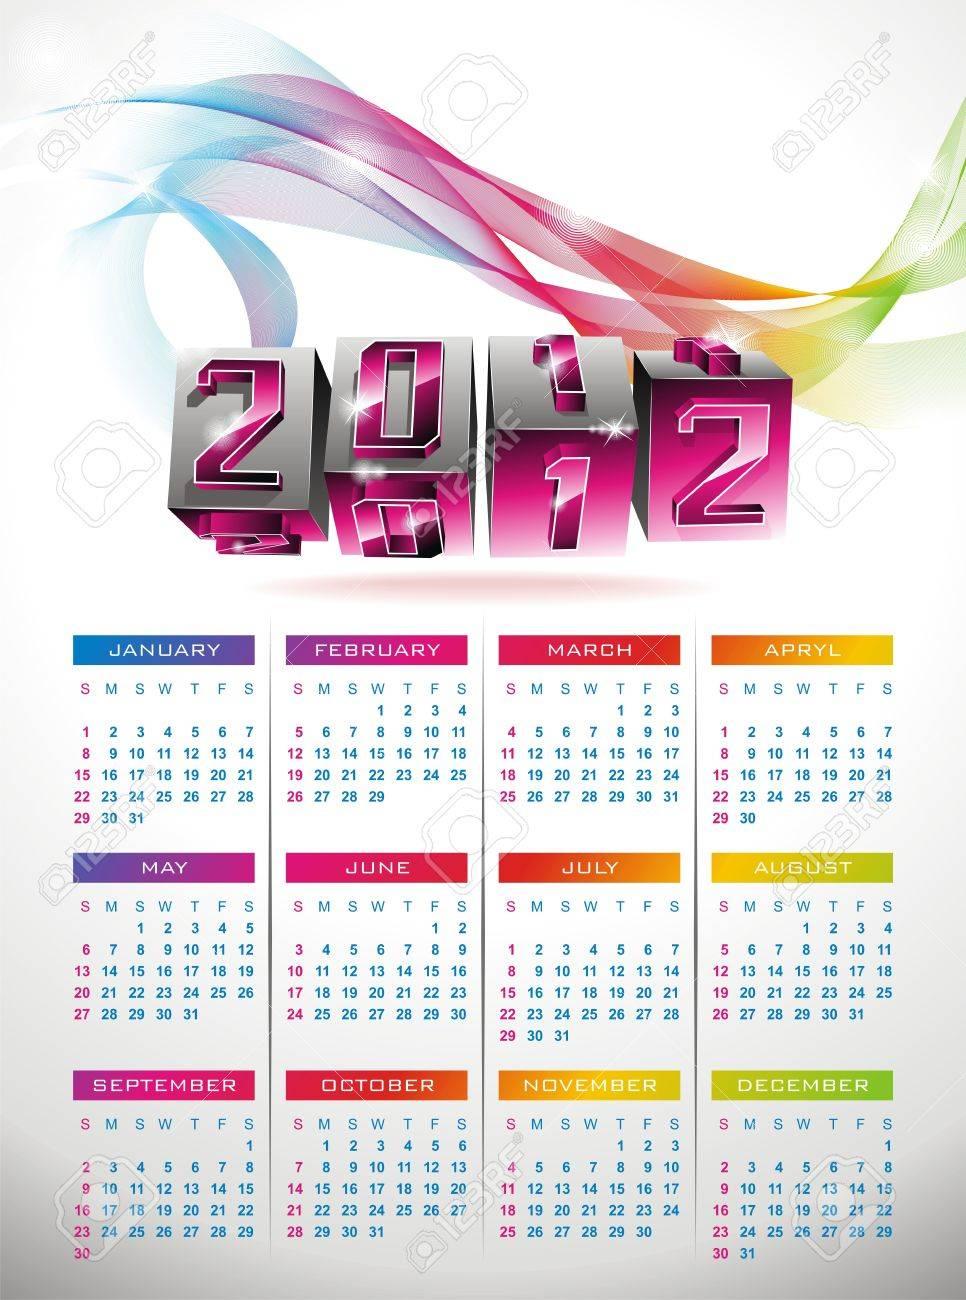 calendar design 2012 with swirl cubes design Stock Vector - 11376895